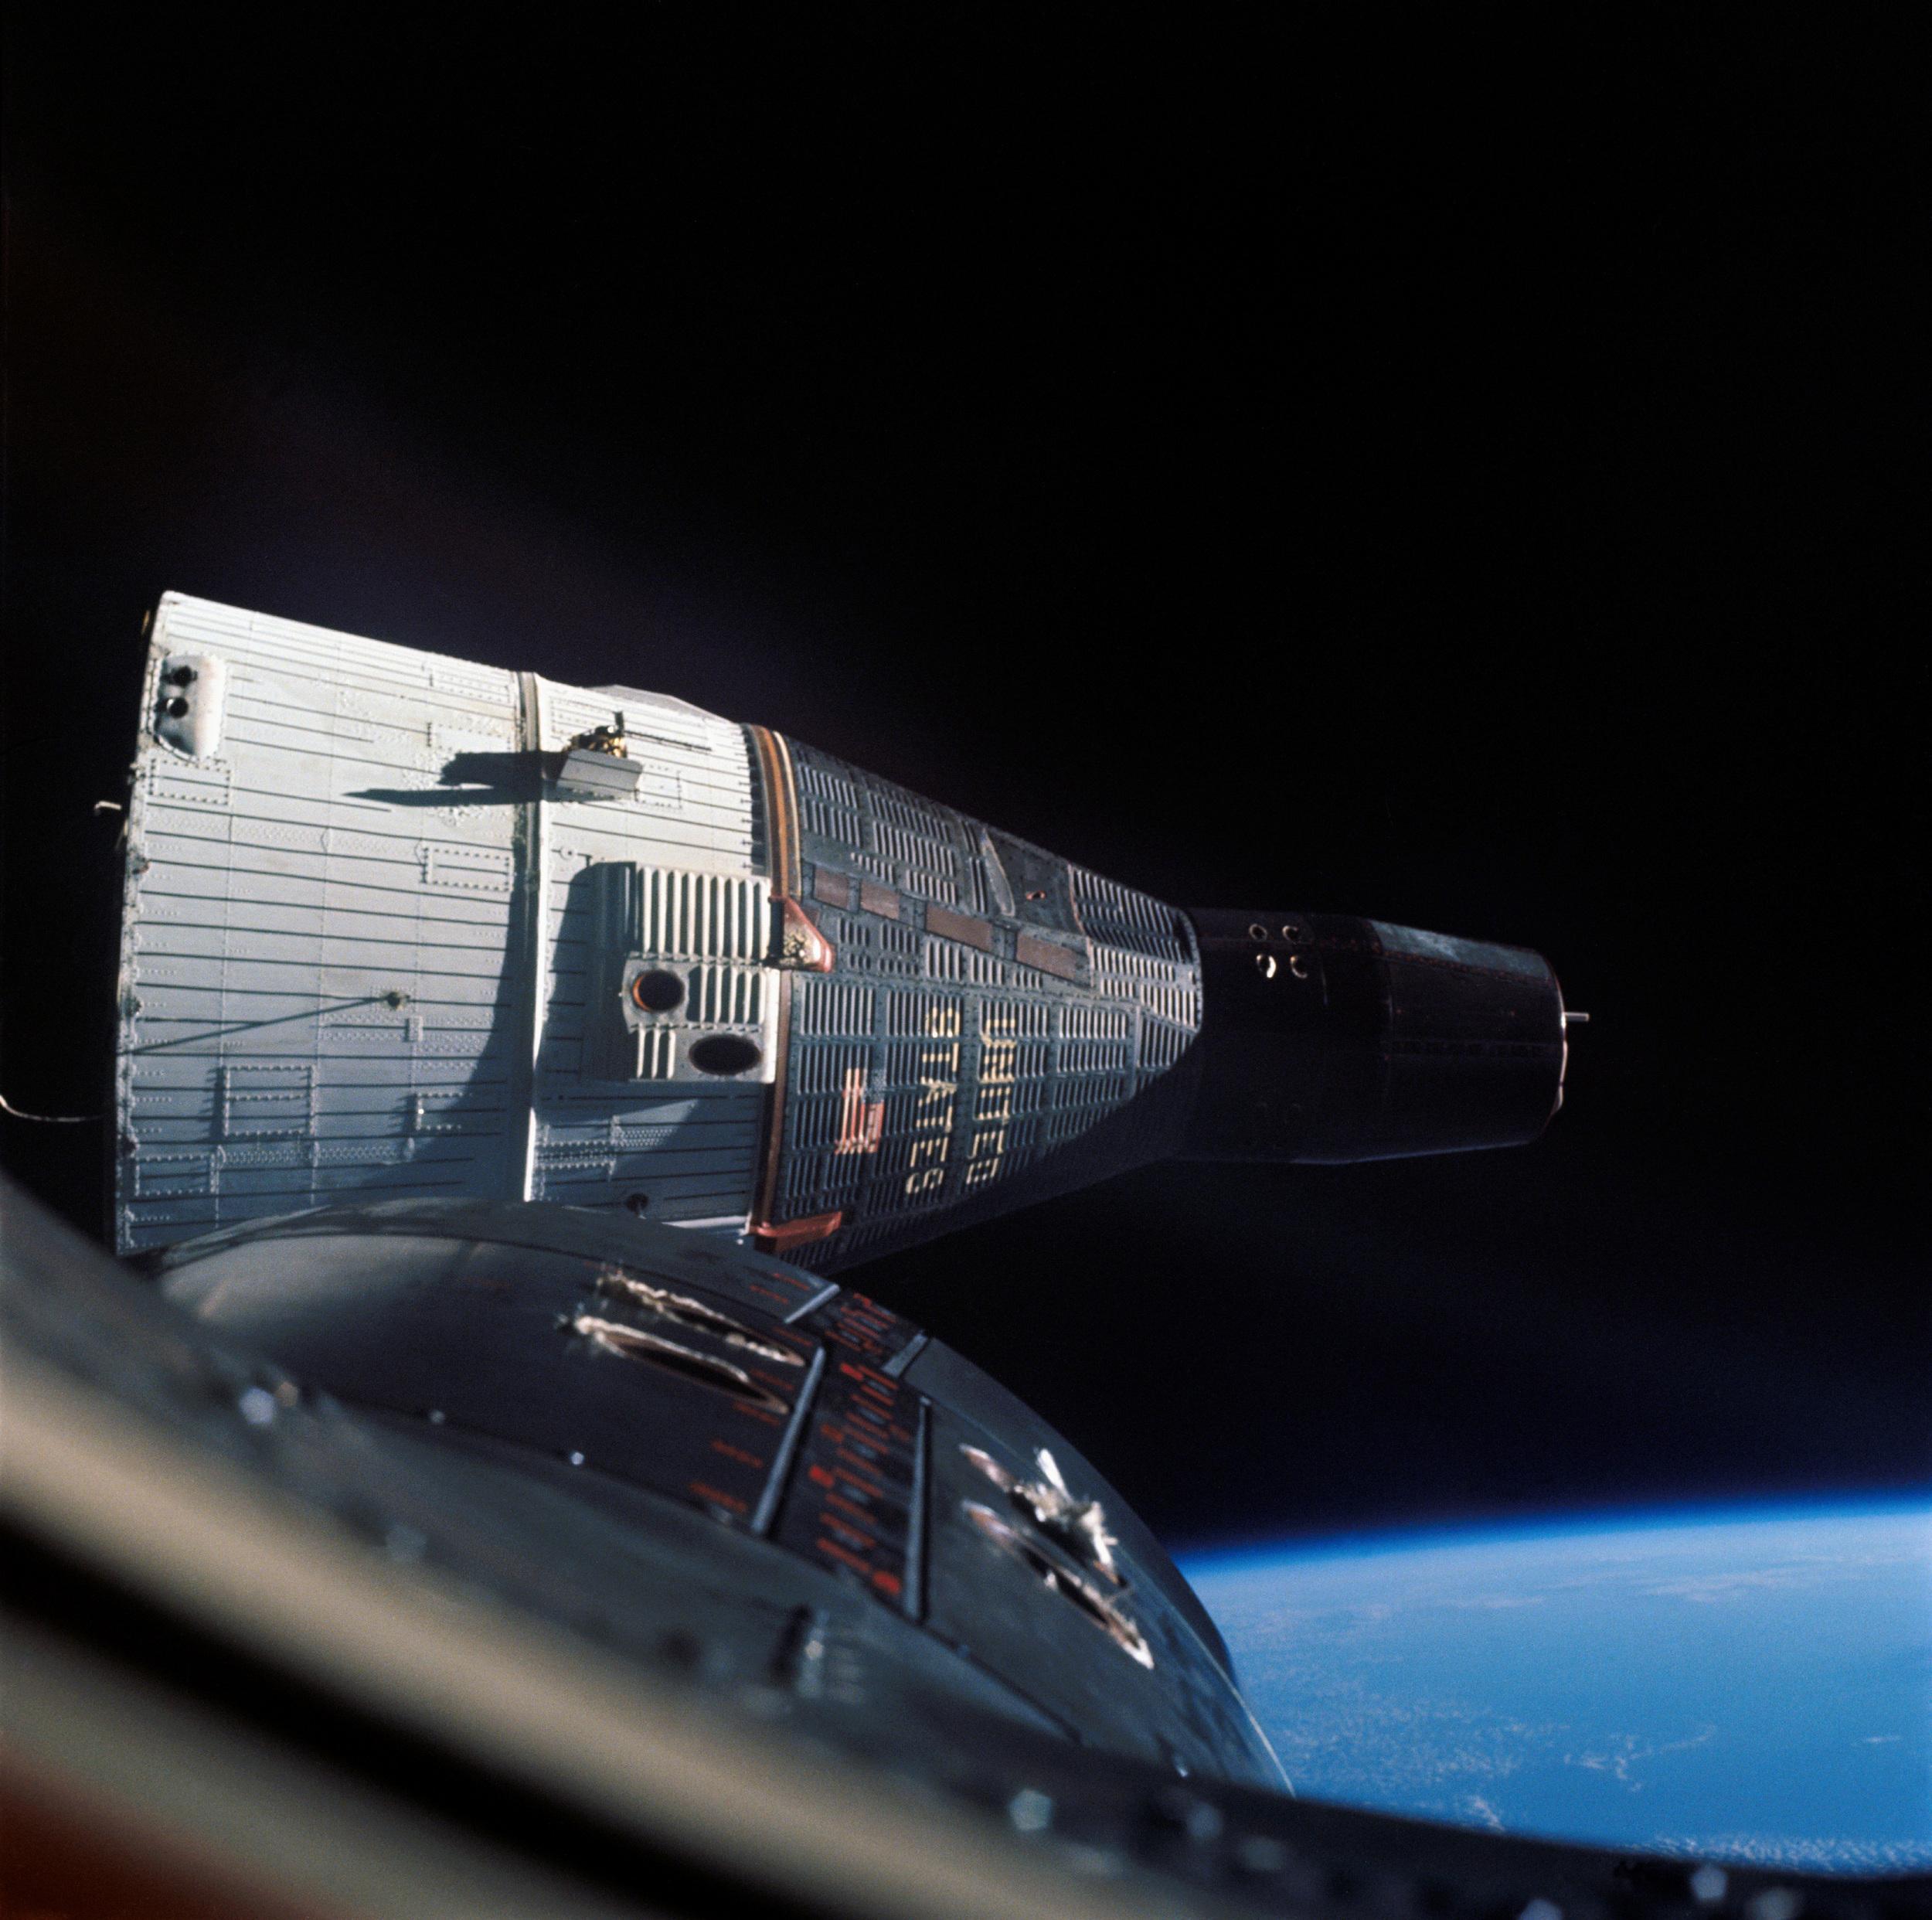 Rendezvous of Gemini 6 and 7, December 1965